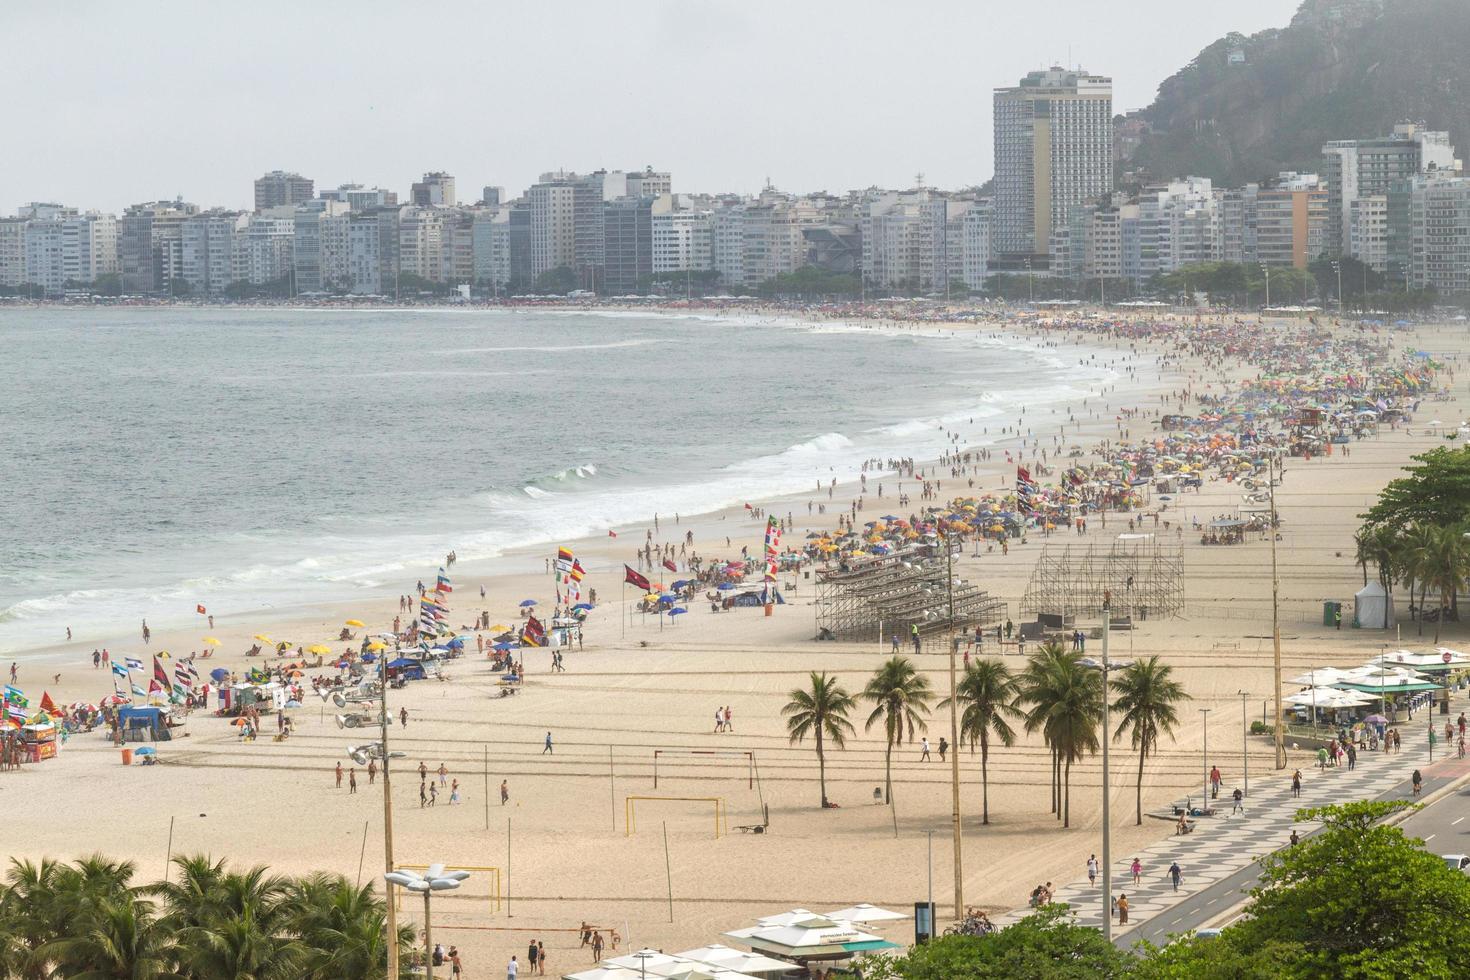 Leme Beach i Copacabana, Rio de Janeiro, Brasilien foto